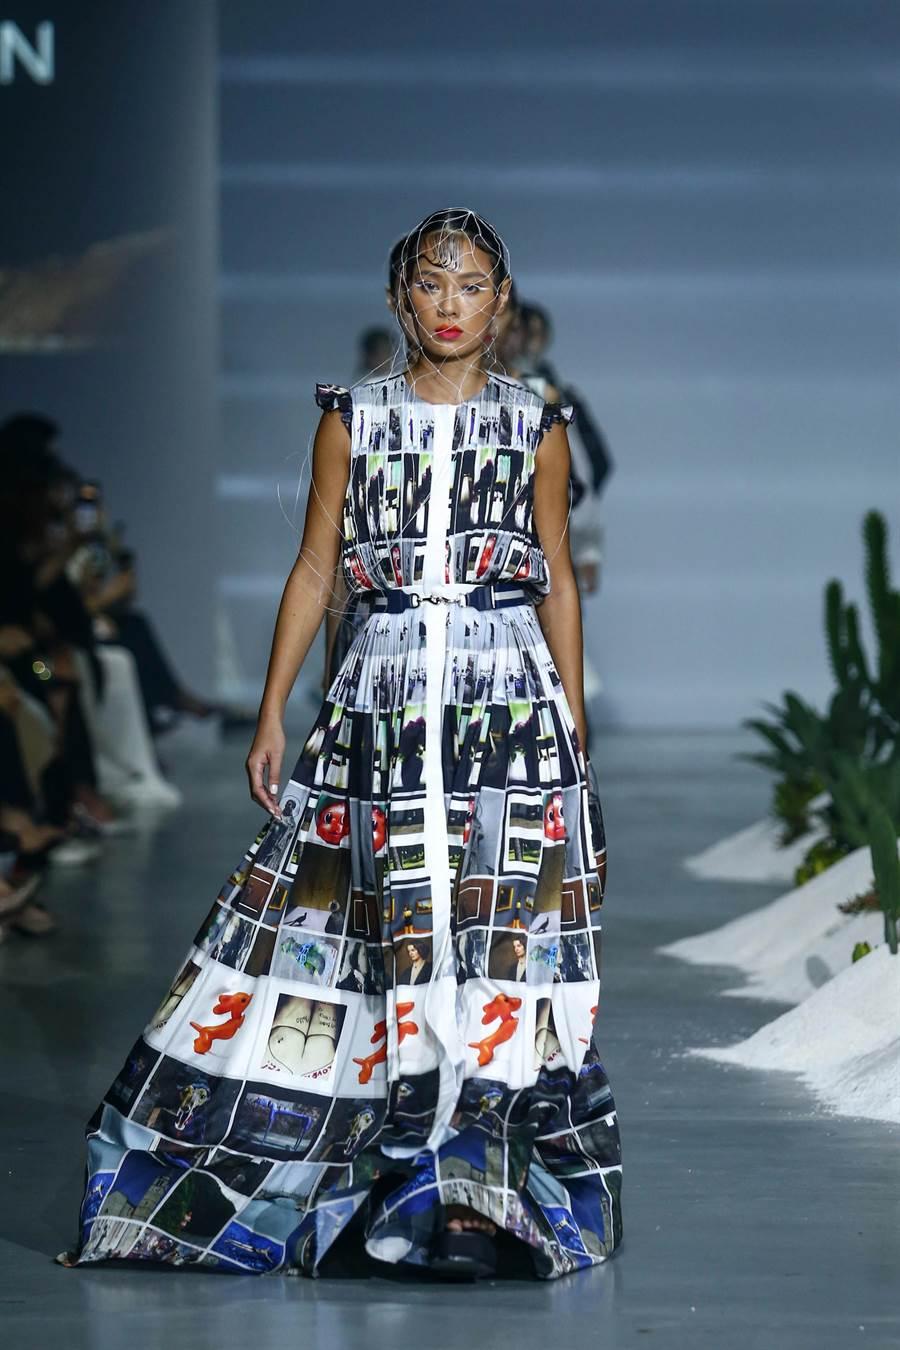 JAMEI CHEN品牌以主題《JAMEI CHEN‧EXILE 放逐》參與《2019臺北時裝週ss20》,本次主題靈感來自創辦人陳季敏設計師及藝術總監郭英聲參加威尼斯雙年展的南歐之旅,從回憶及紀錄圖像中,王麗雅身上穿的衣服呈現宛如克林姆的名畫般典雅。(鄧博仁攝)